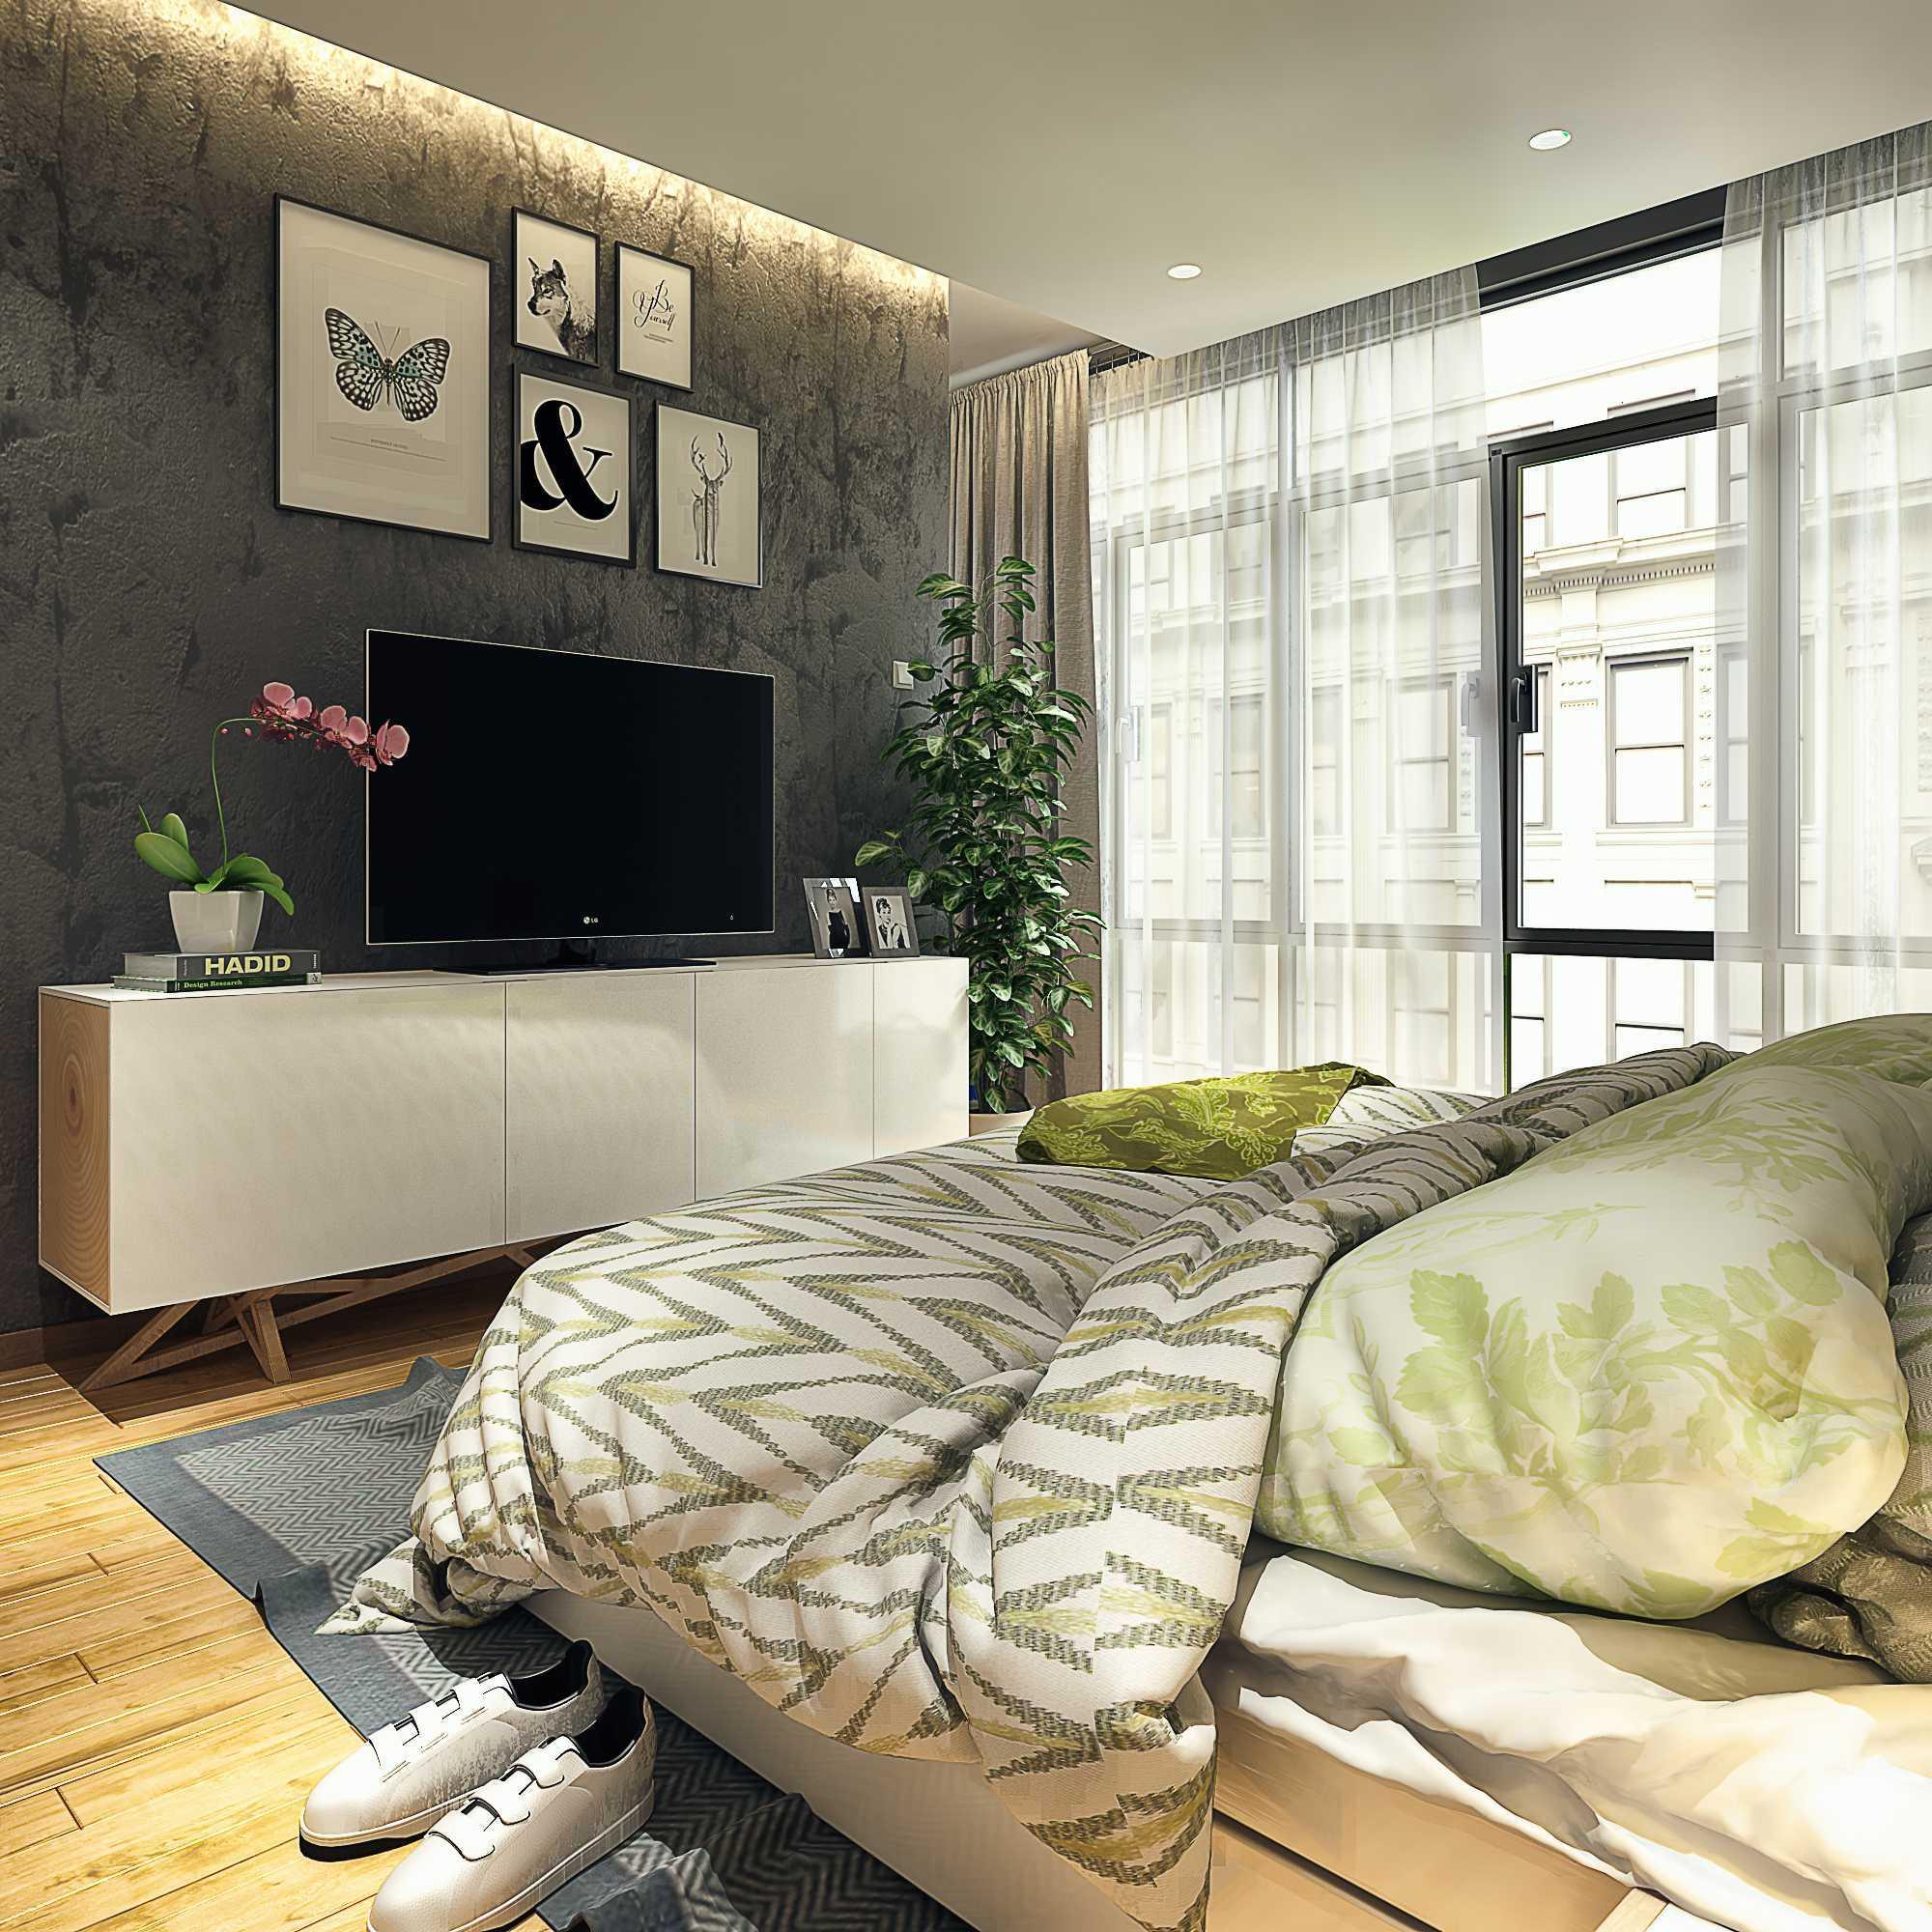 Wahyu Endra Pranata Modern Bedroom Indonesia Indonesia 1   44289